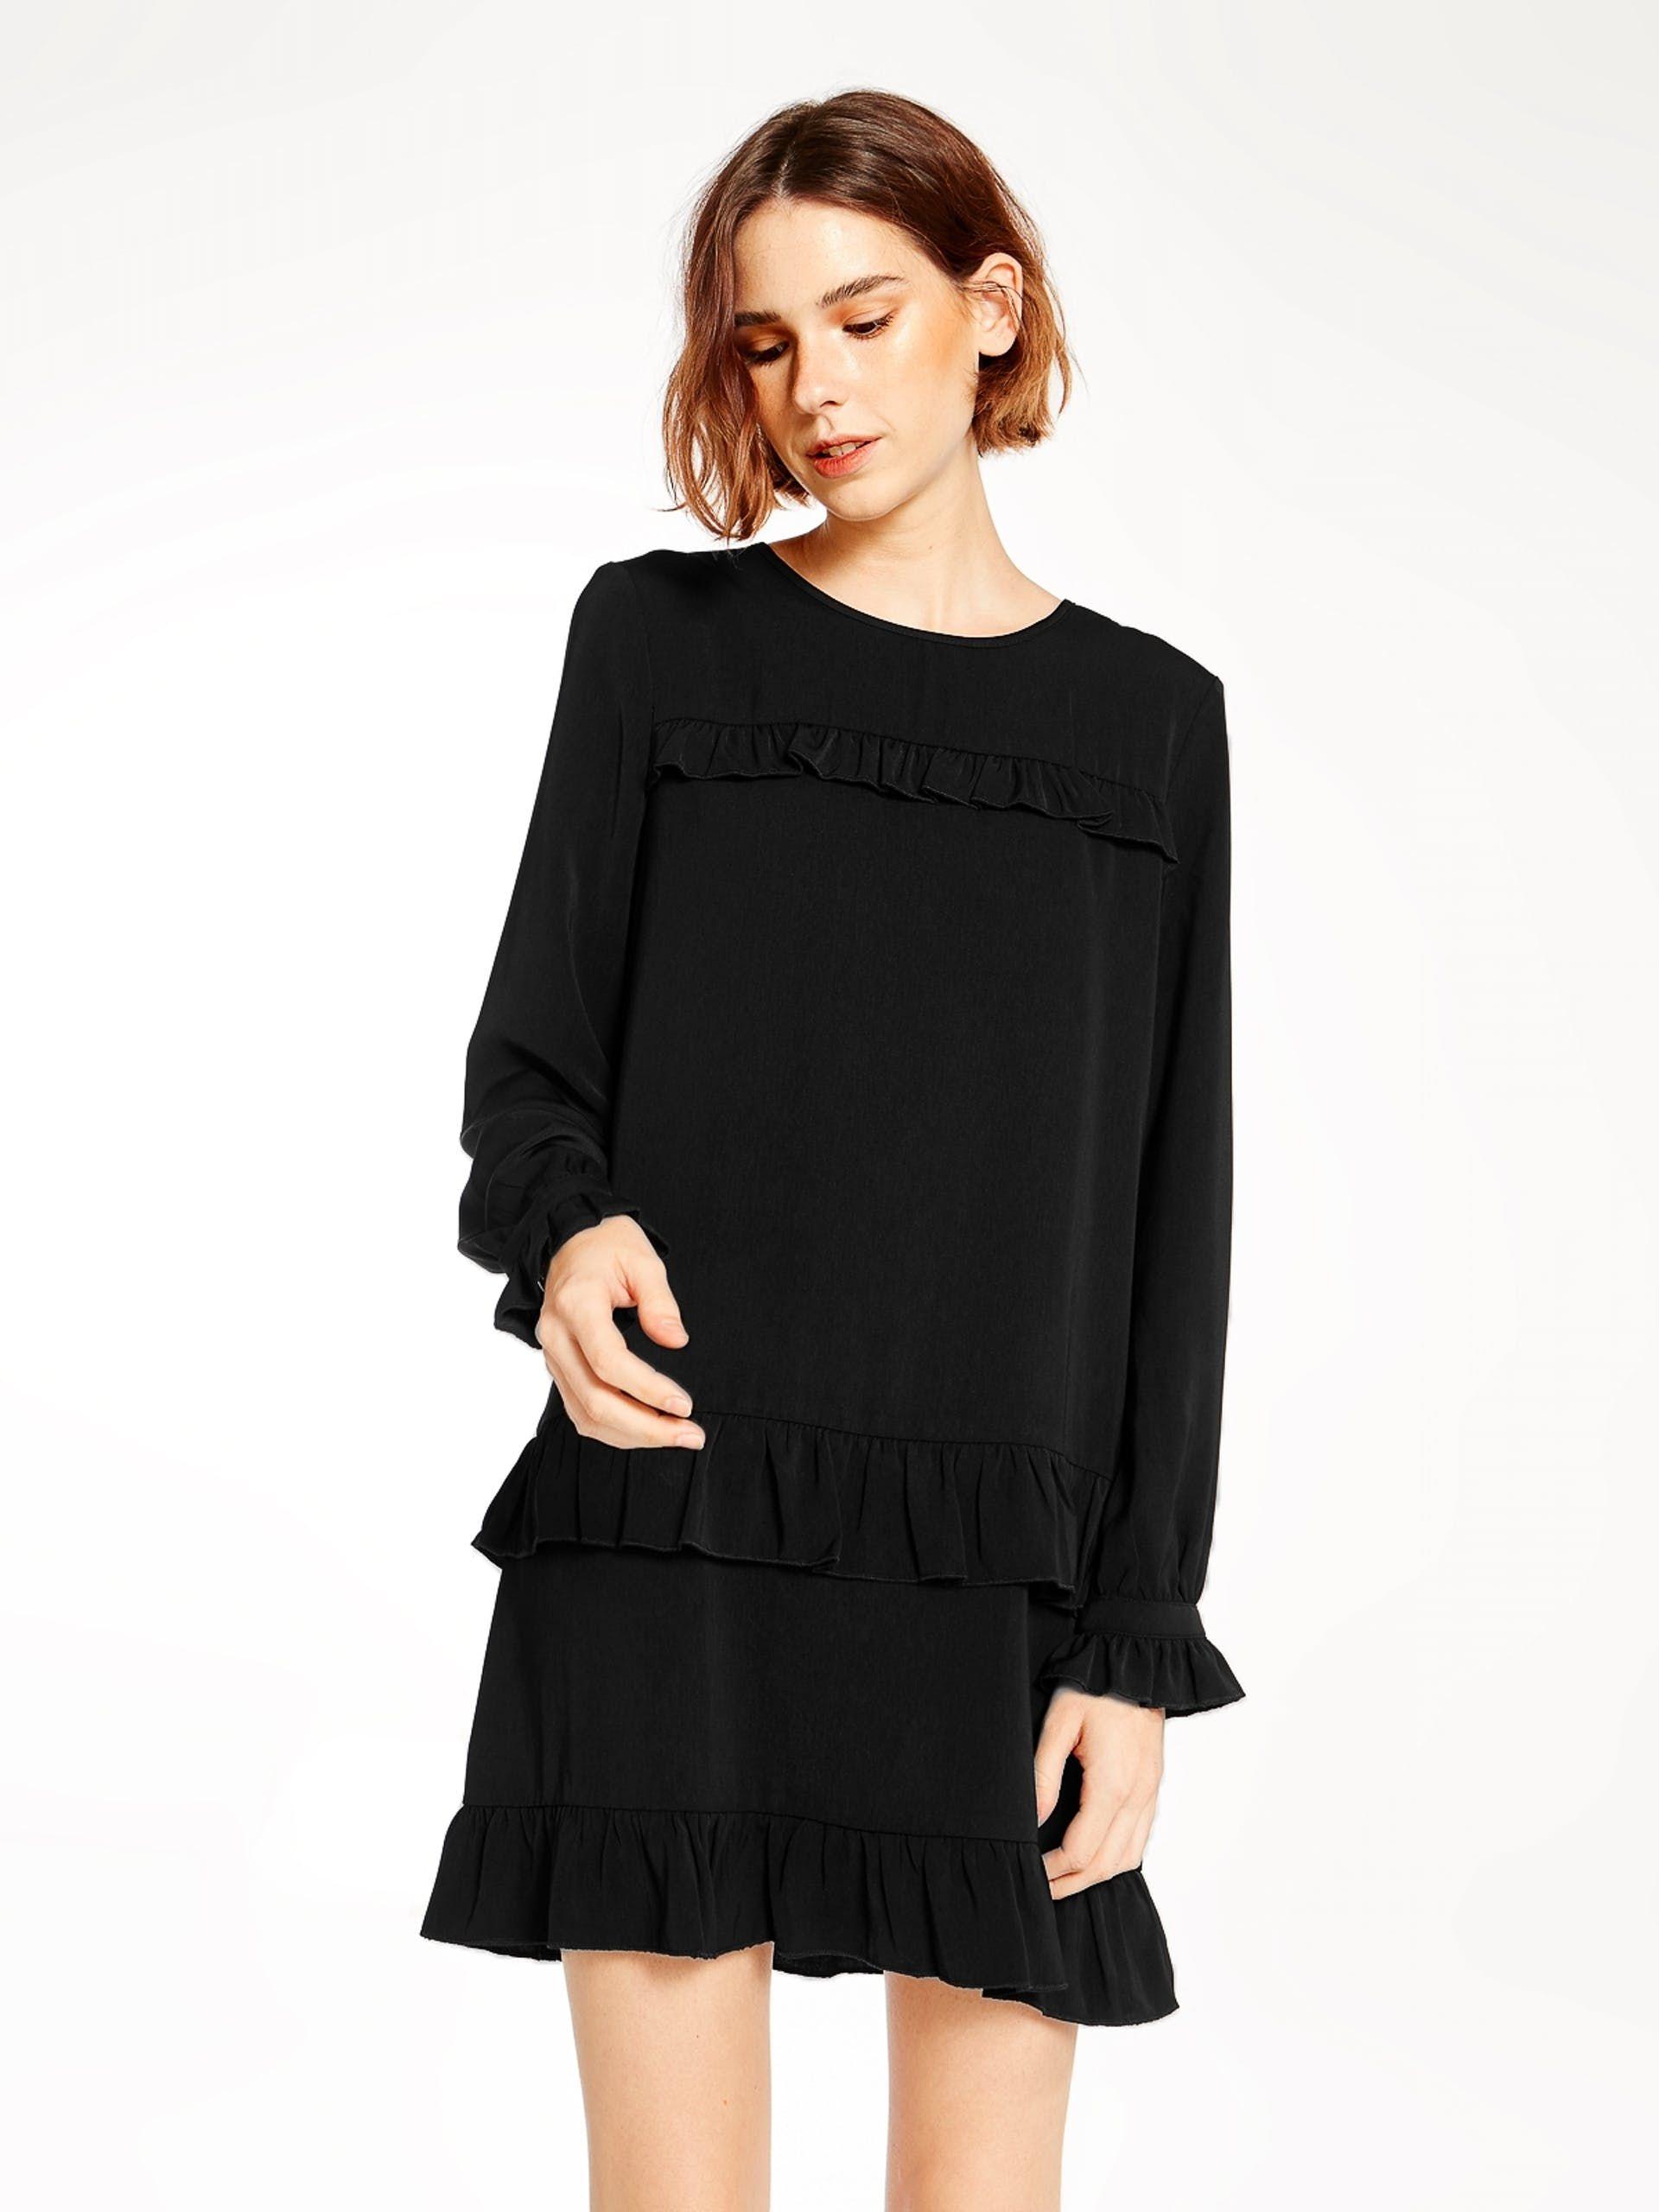 Kalisha Long Sleeve Ruffle Dress Black Pomelo Singapore pleats